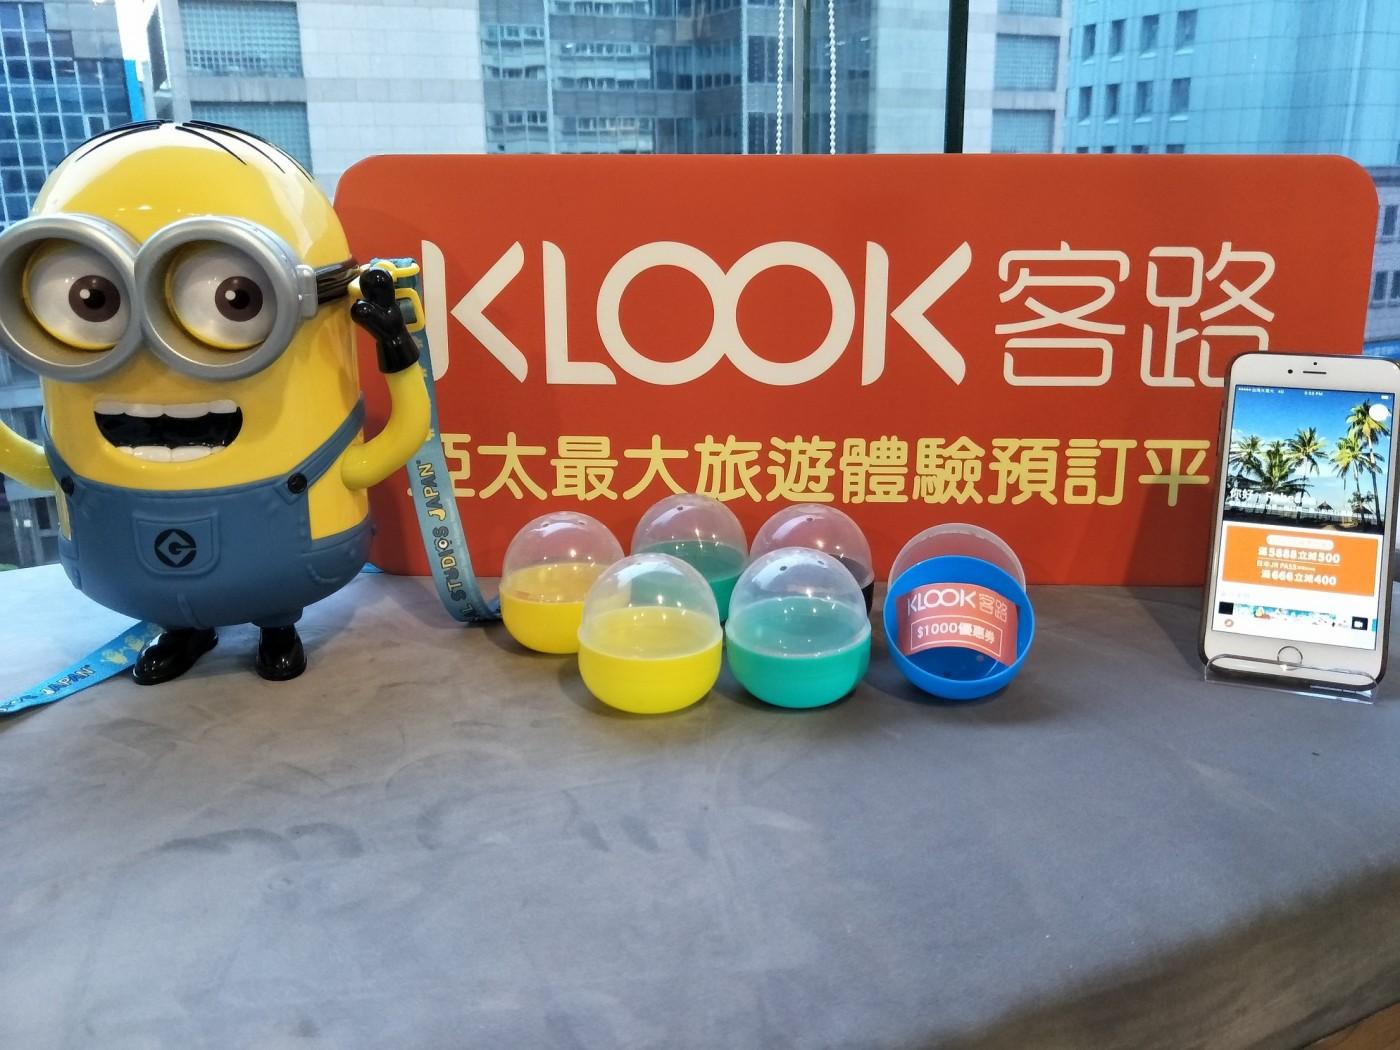 KLOOK客路首次參加夏季旅展,祭出1350組熱門樂園 、景點門票、行程買一送一活動